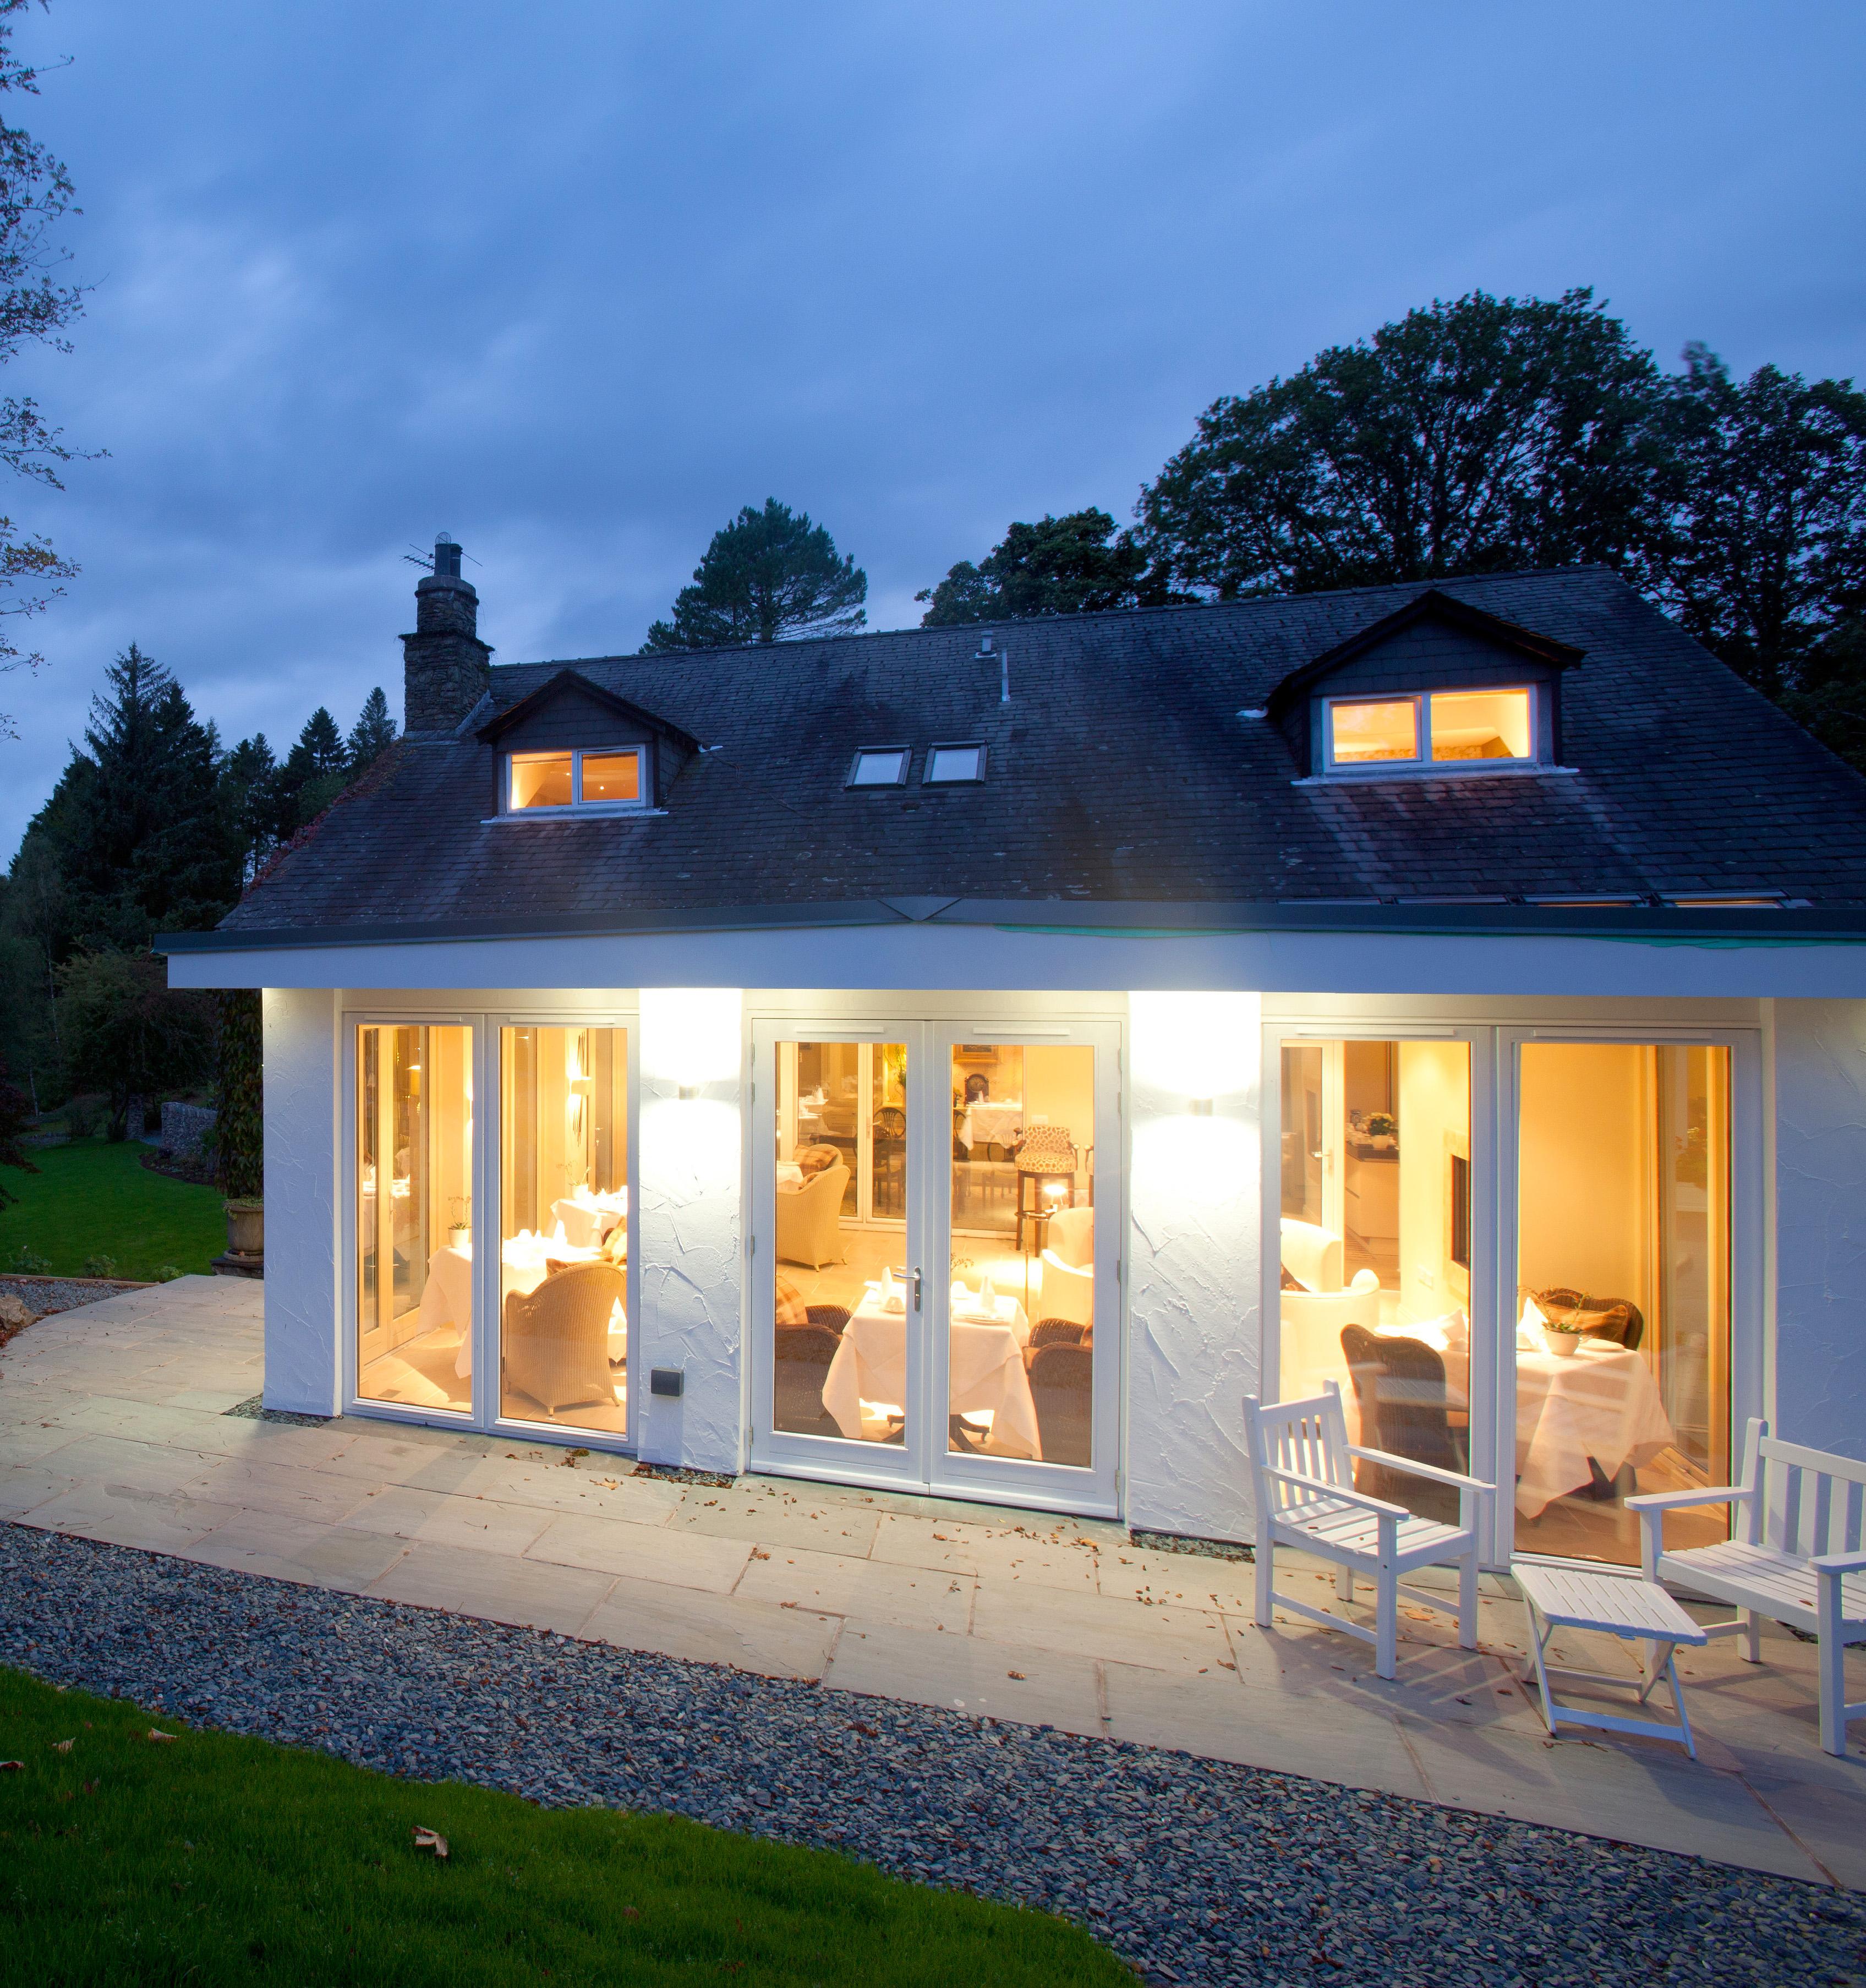 Quality timber door installation from AJ&D Chapelhow Ltd, Cumbria